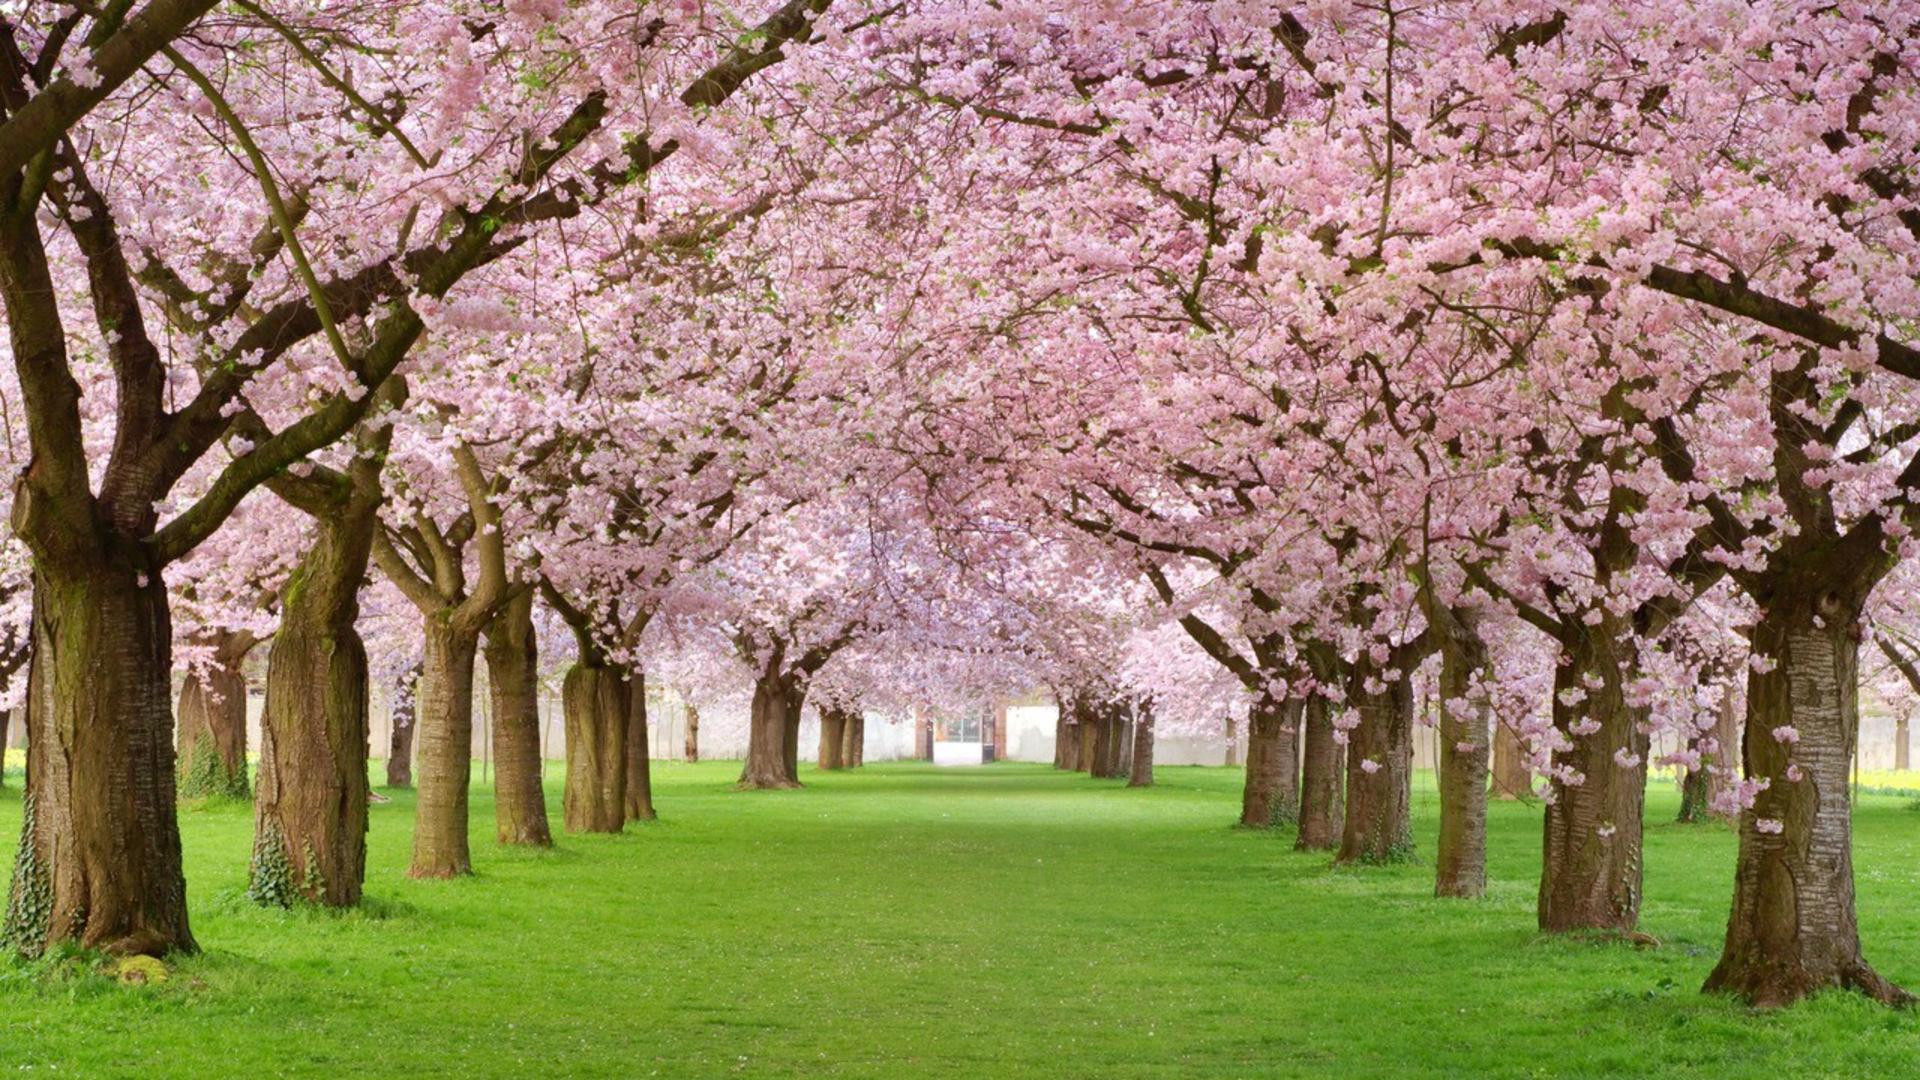 Spring-Season-Wallpapers-HD-HWZ008788 - easylife-online.com